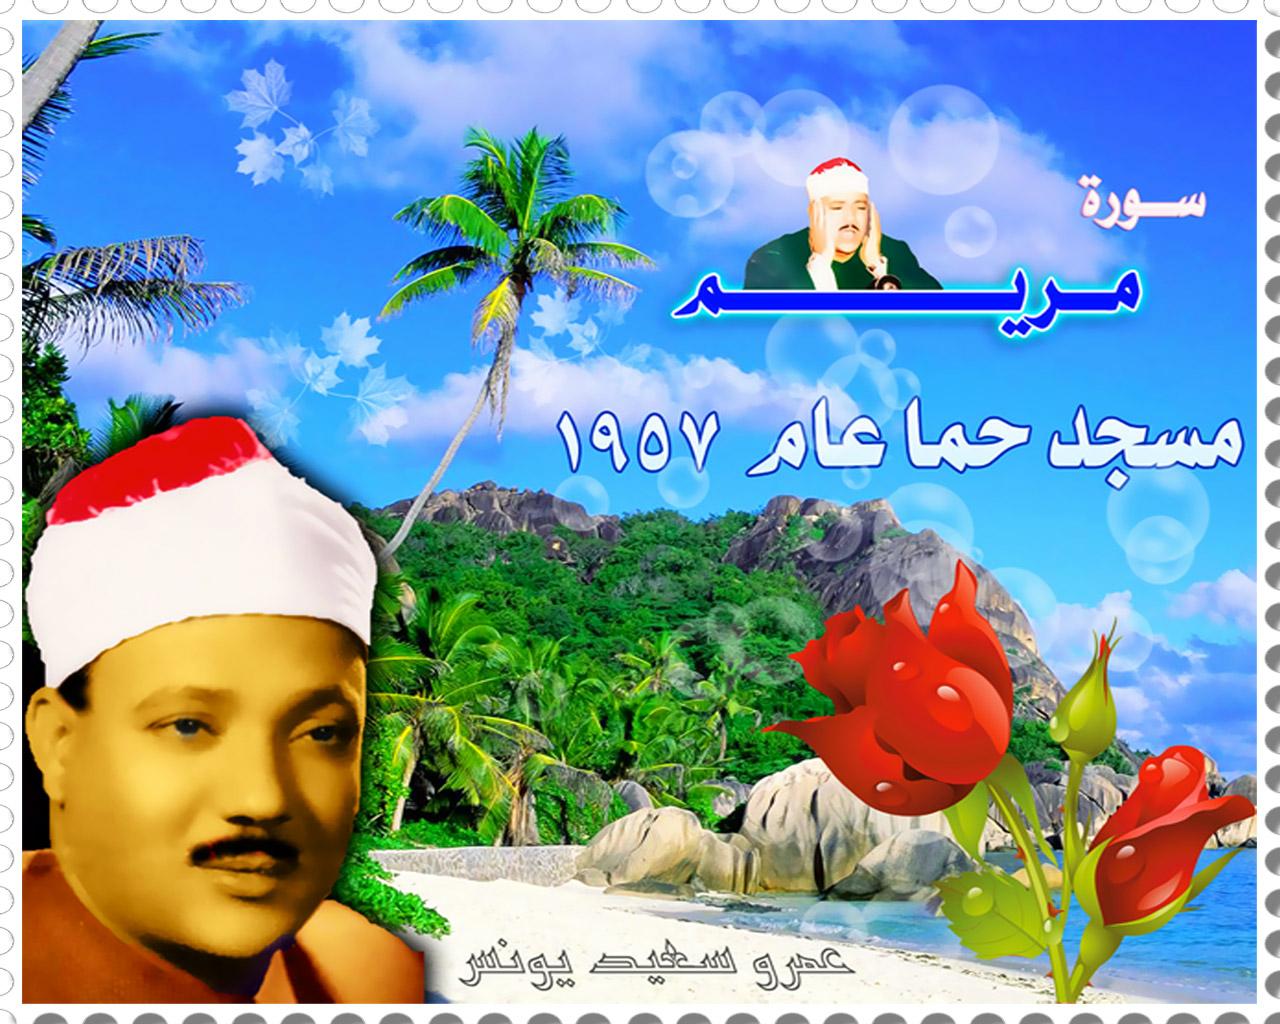 ��� ������ ������� ��� ������  , ����� ��� ������ ��� �����  ������ ����� , Photos Abdulbasit Abduls new_1421851070_371.j